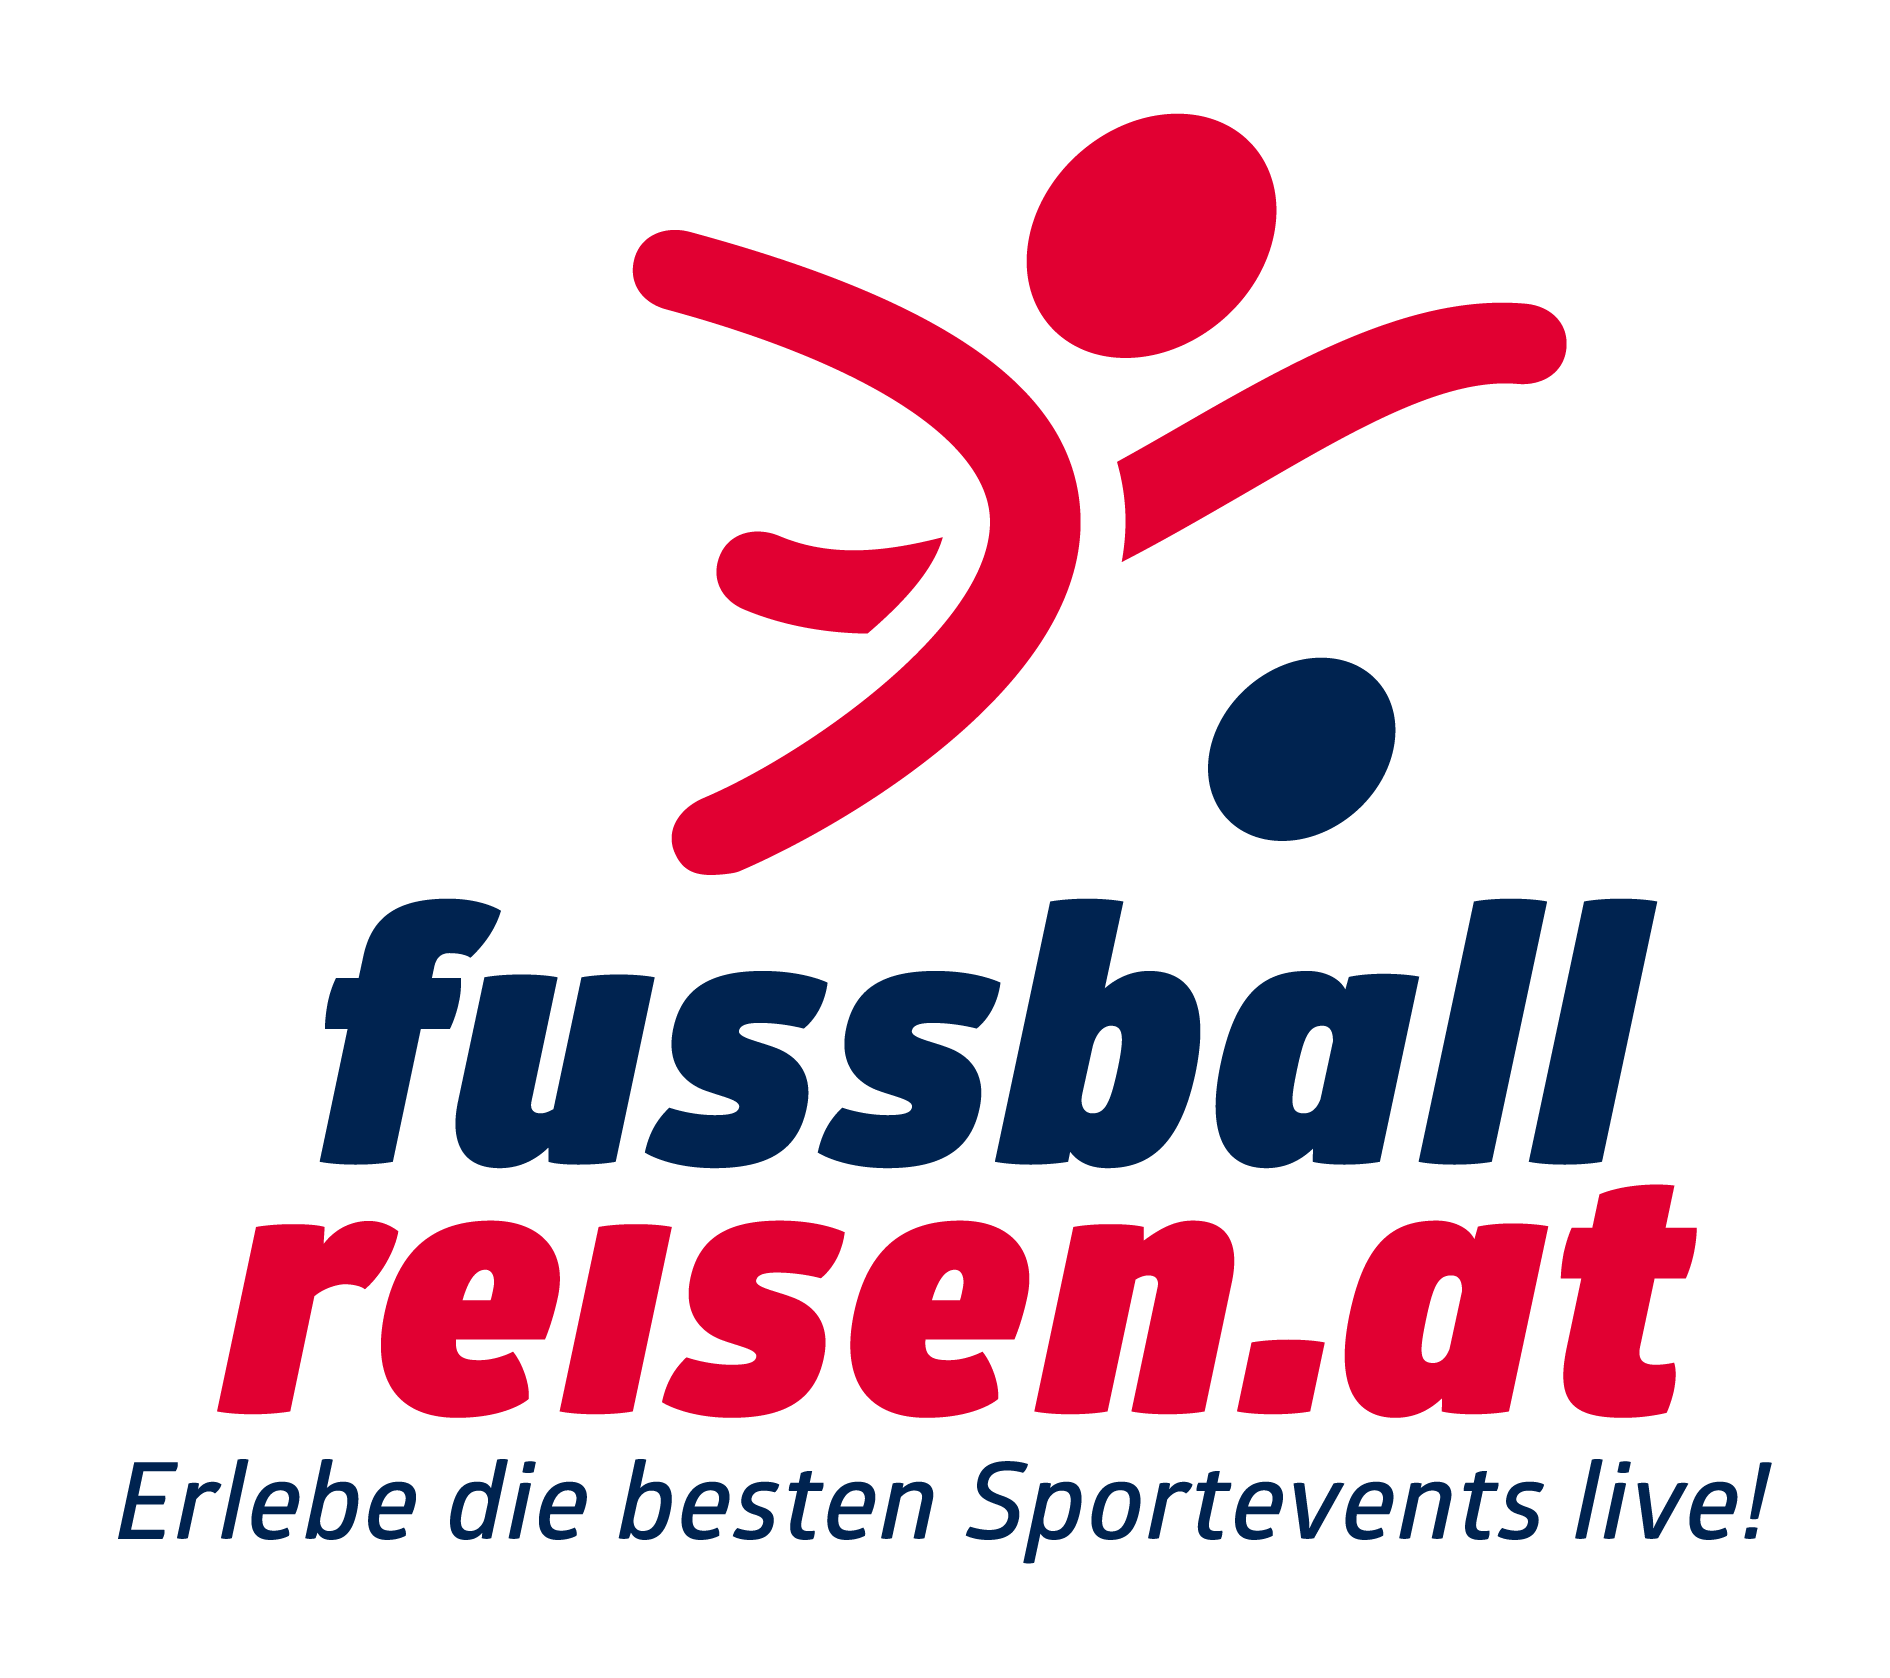 fussballreisen.at & FC Admira Wacker Mödling starten Kooperation